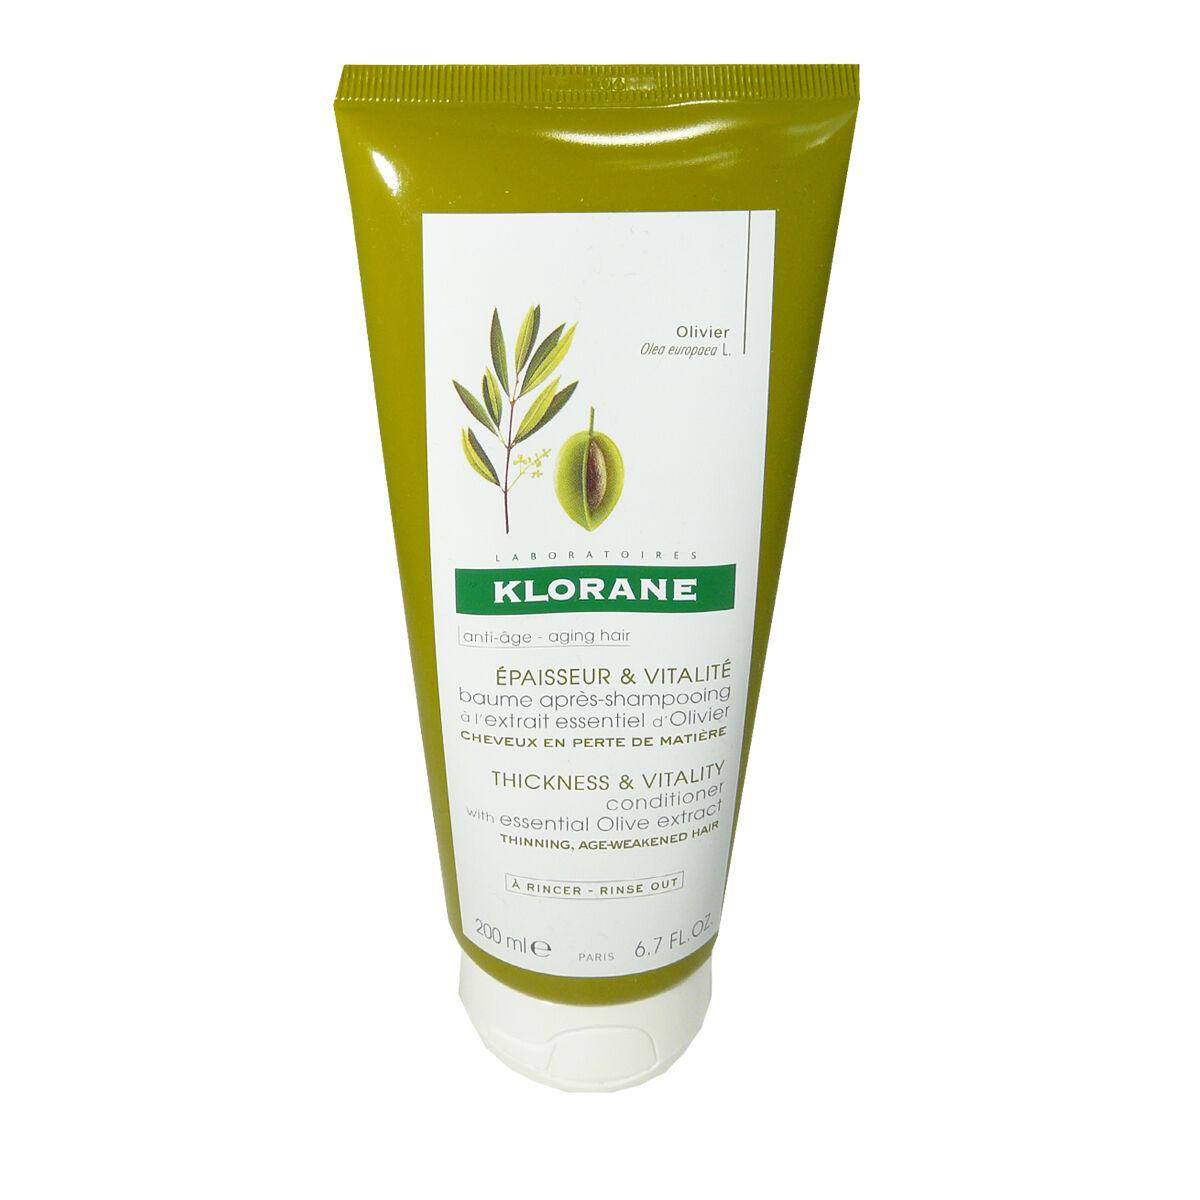 Klorane anti-age epaisseur & vitalite 200 ml a l'extrait essentiel d'olivier